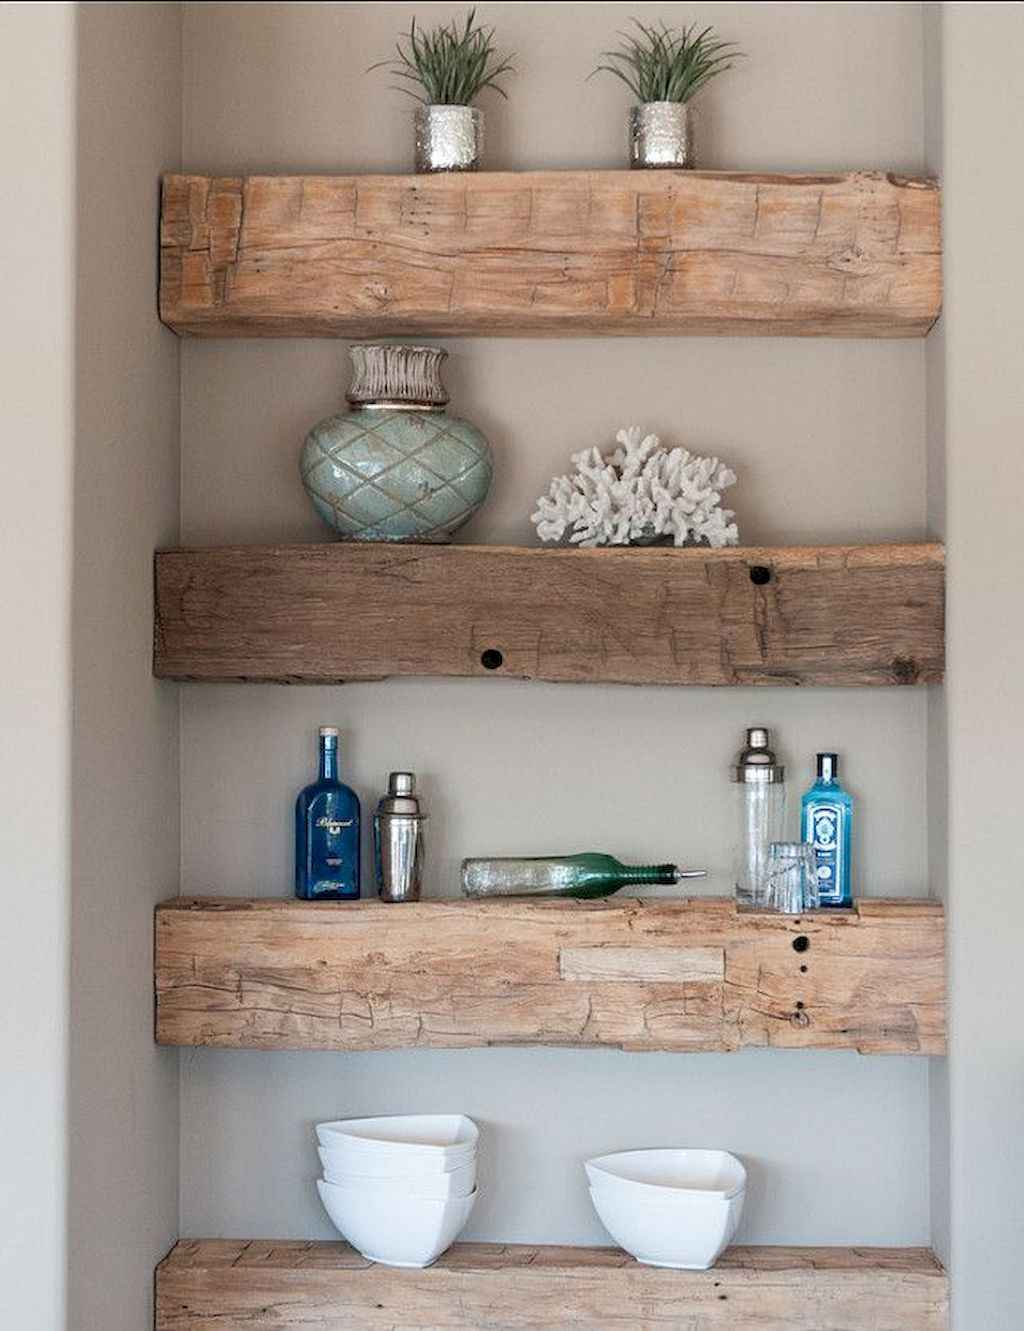 Cool bathroom storage shelves organization ideas (69)